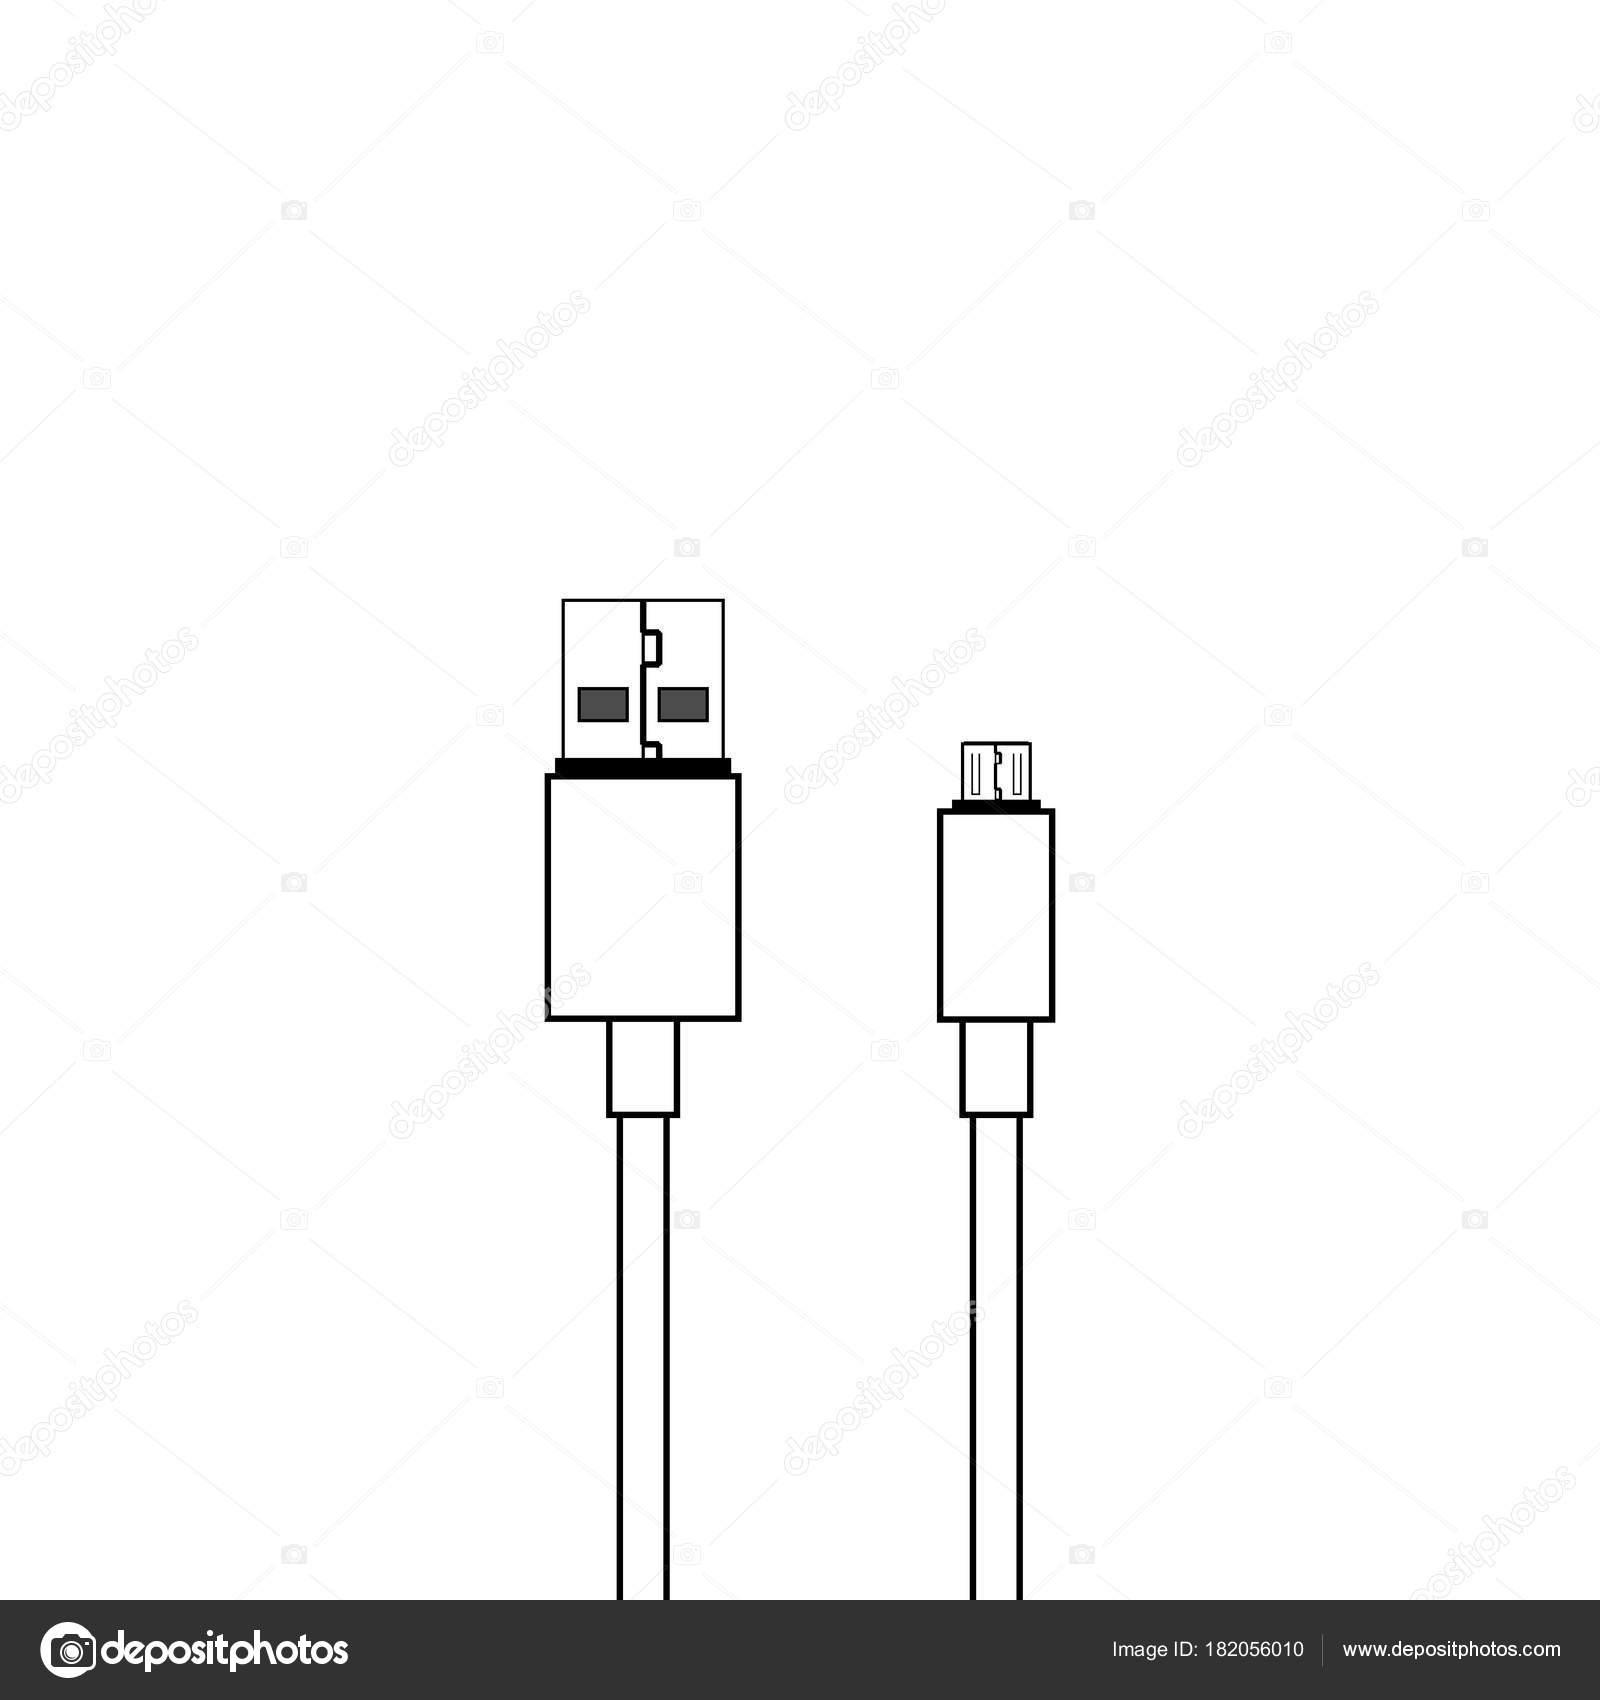 usb and micro usb cable vector icon stock vector c binik1 182056010 https depositphotos com 182056010 stock illustration usb and micro usb cable html